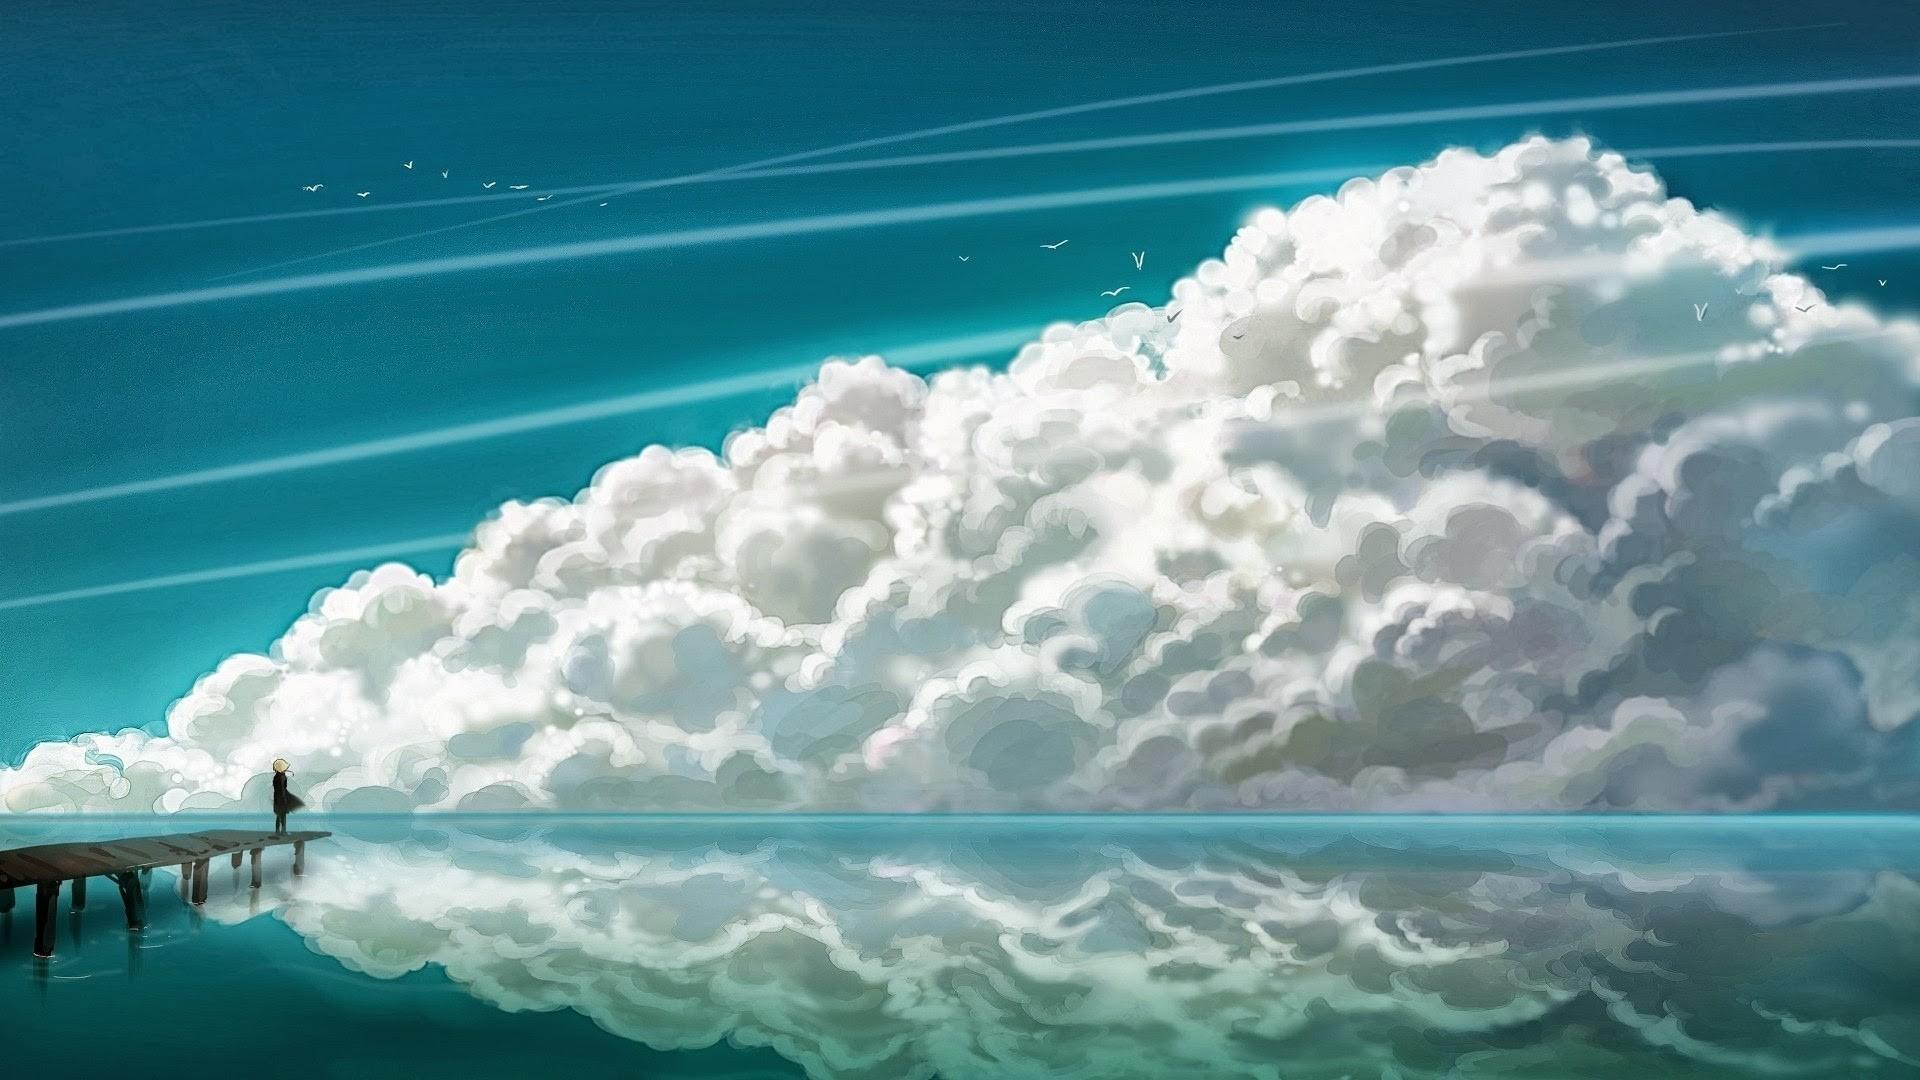 Anime Clouds Full HD Wallpaper